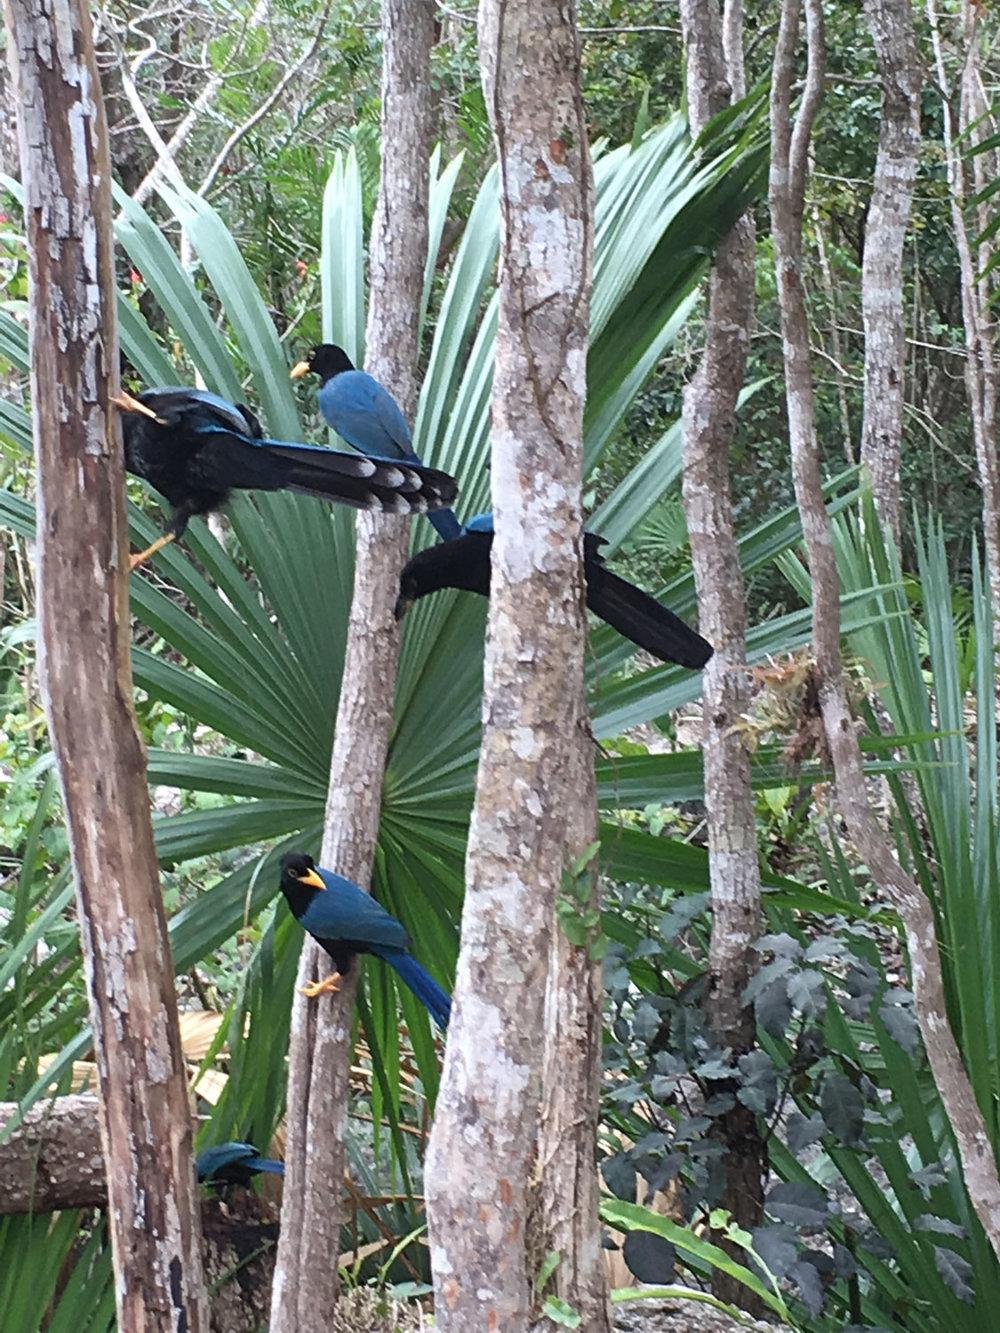 Hammocks_and_Ruins_Riviera_Maya_Mexico_Explore_What_to_Do_Playa_del_Carmen_Cenotes_6.jpg